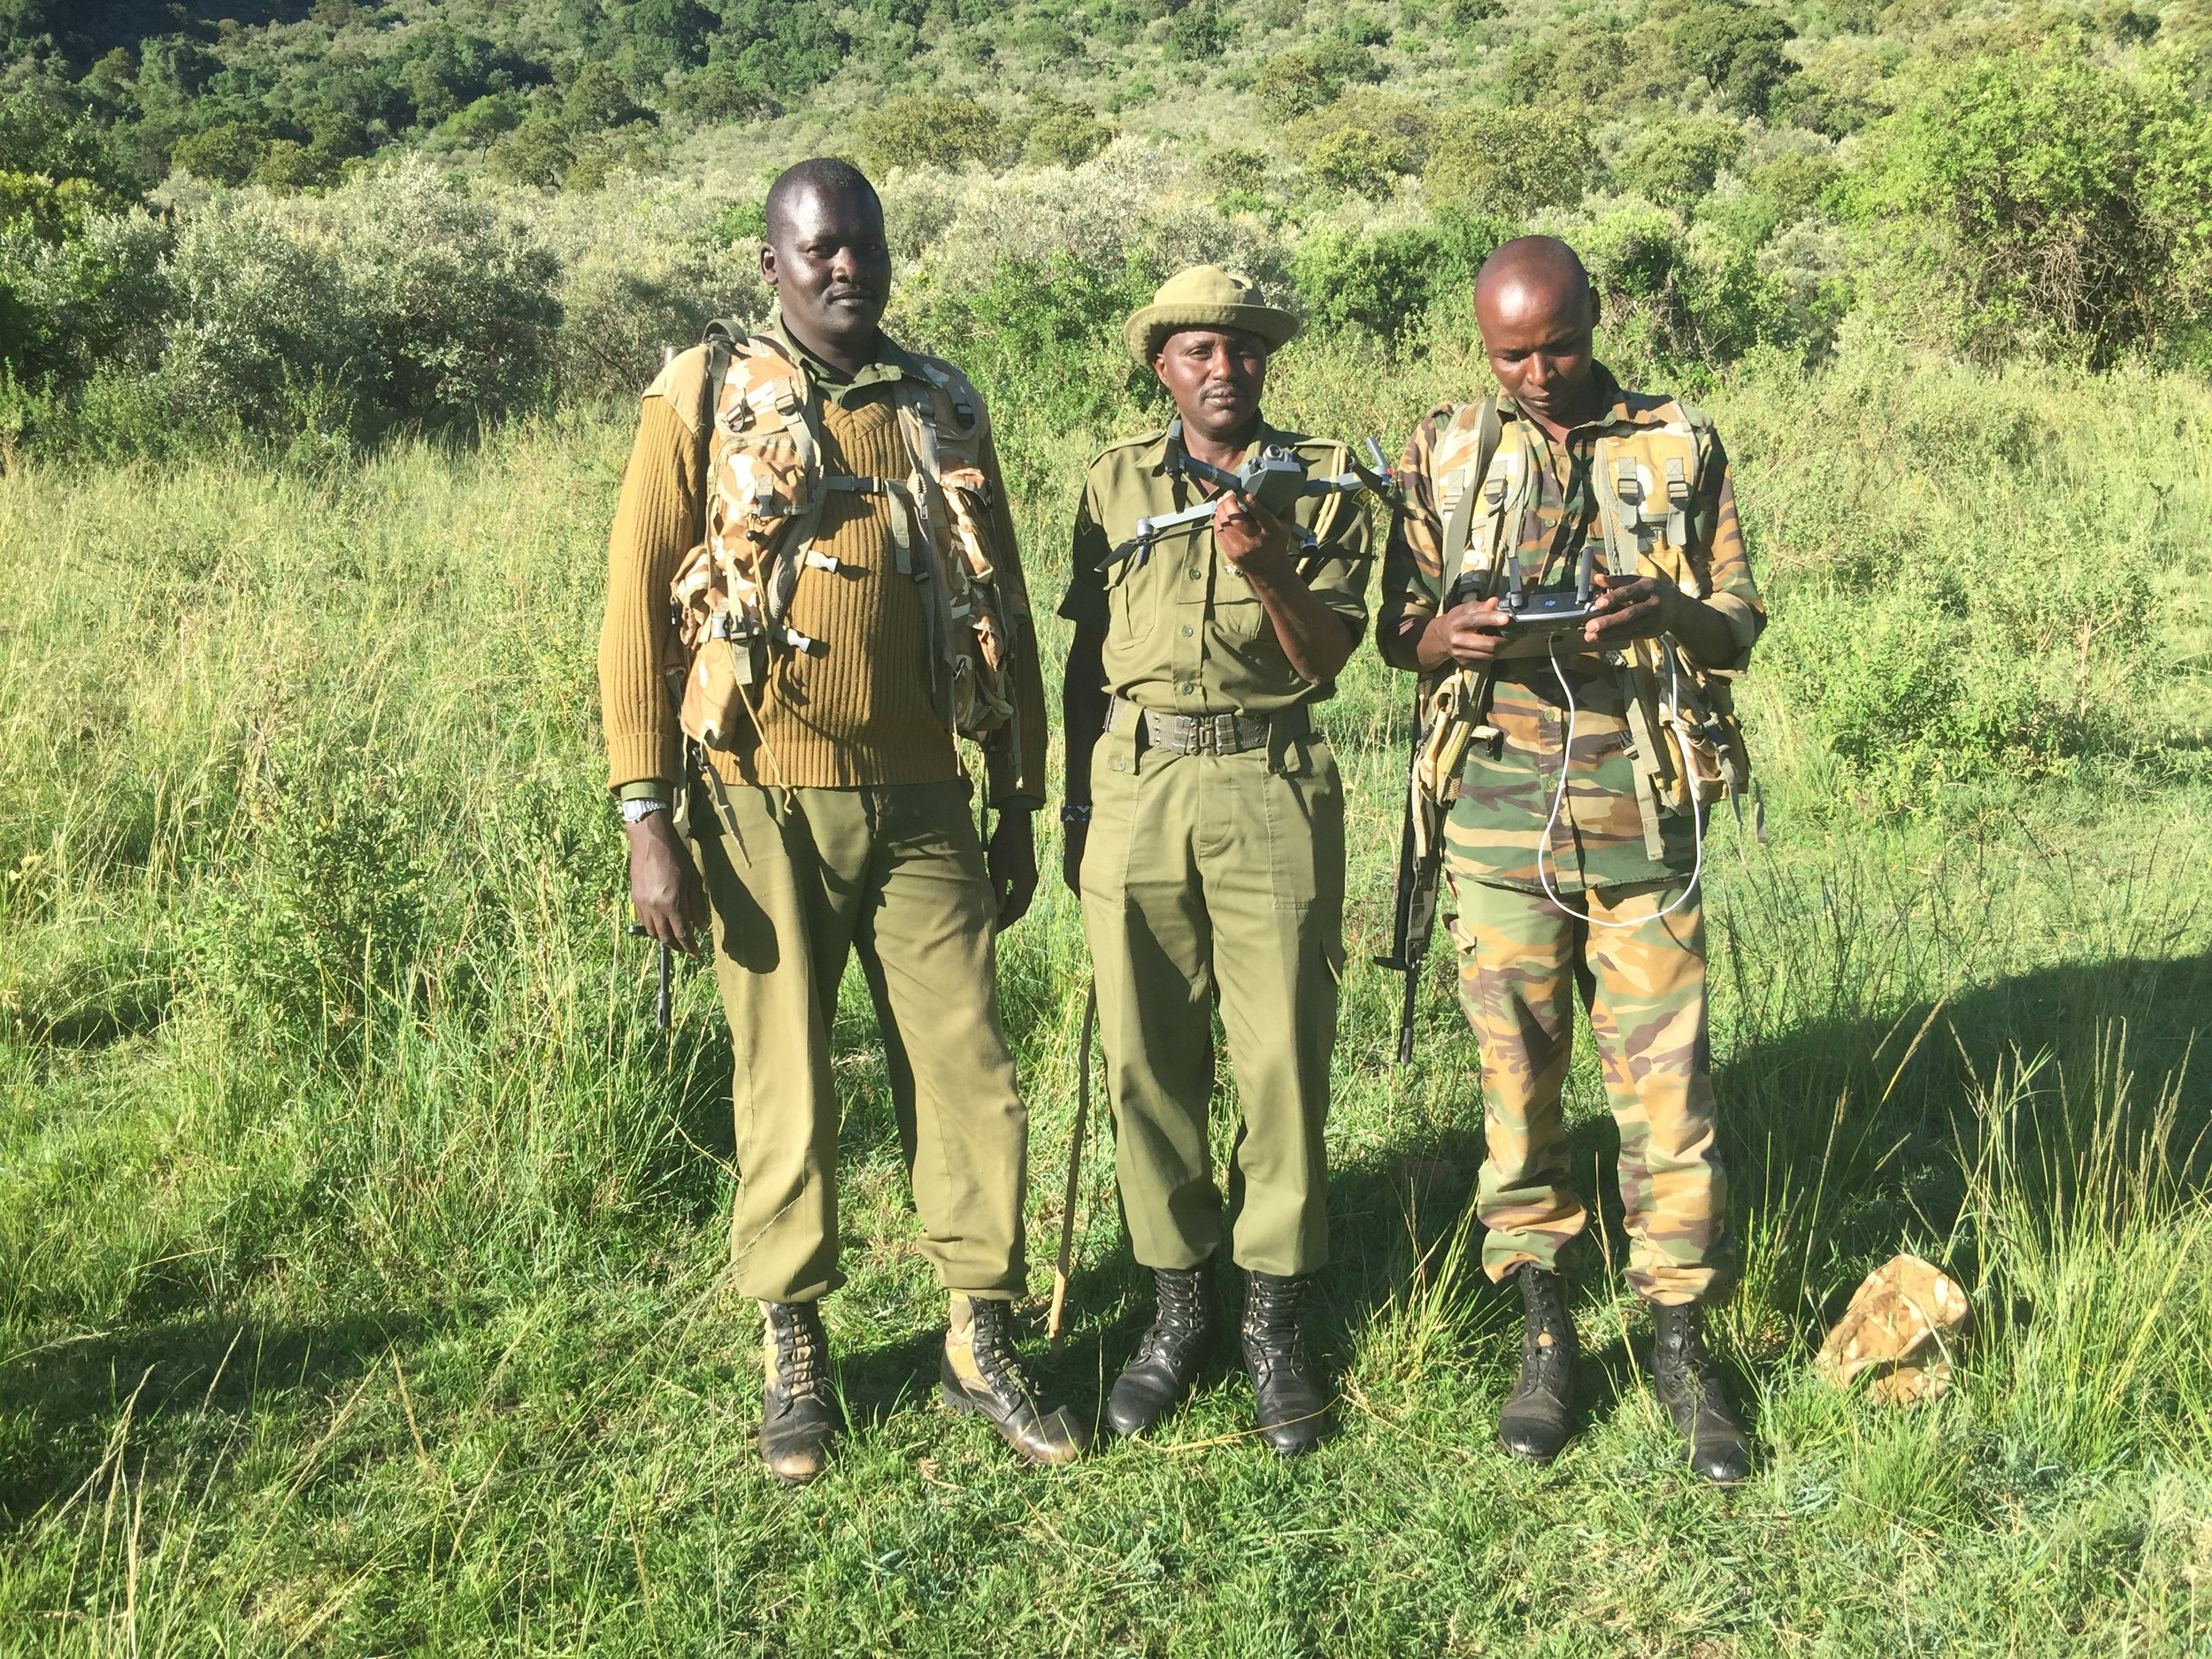 kenyanrangersdrones1.jpg